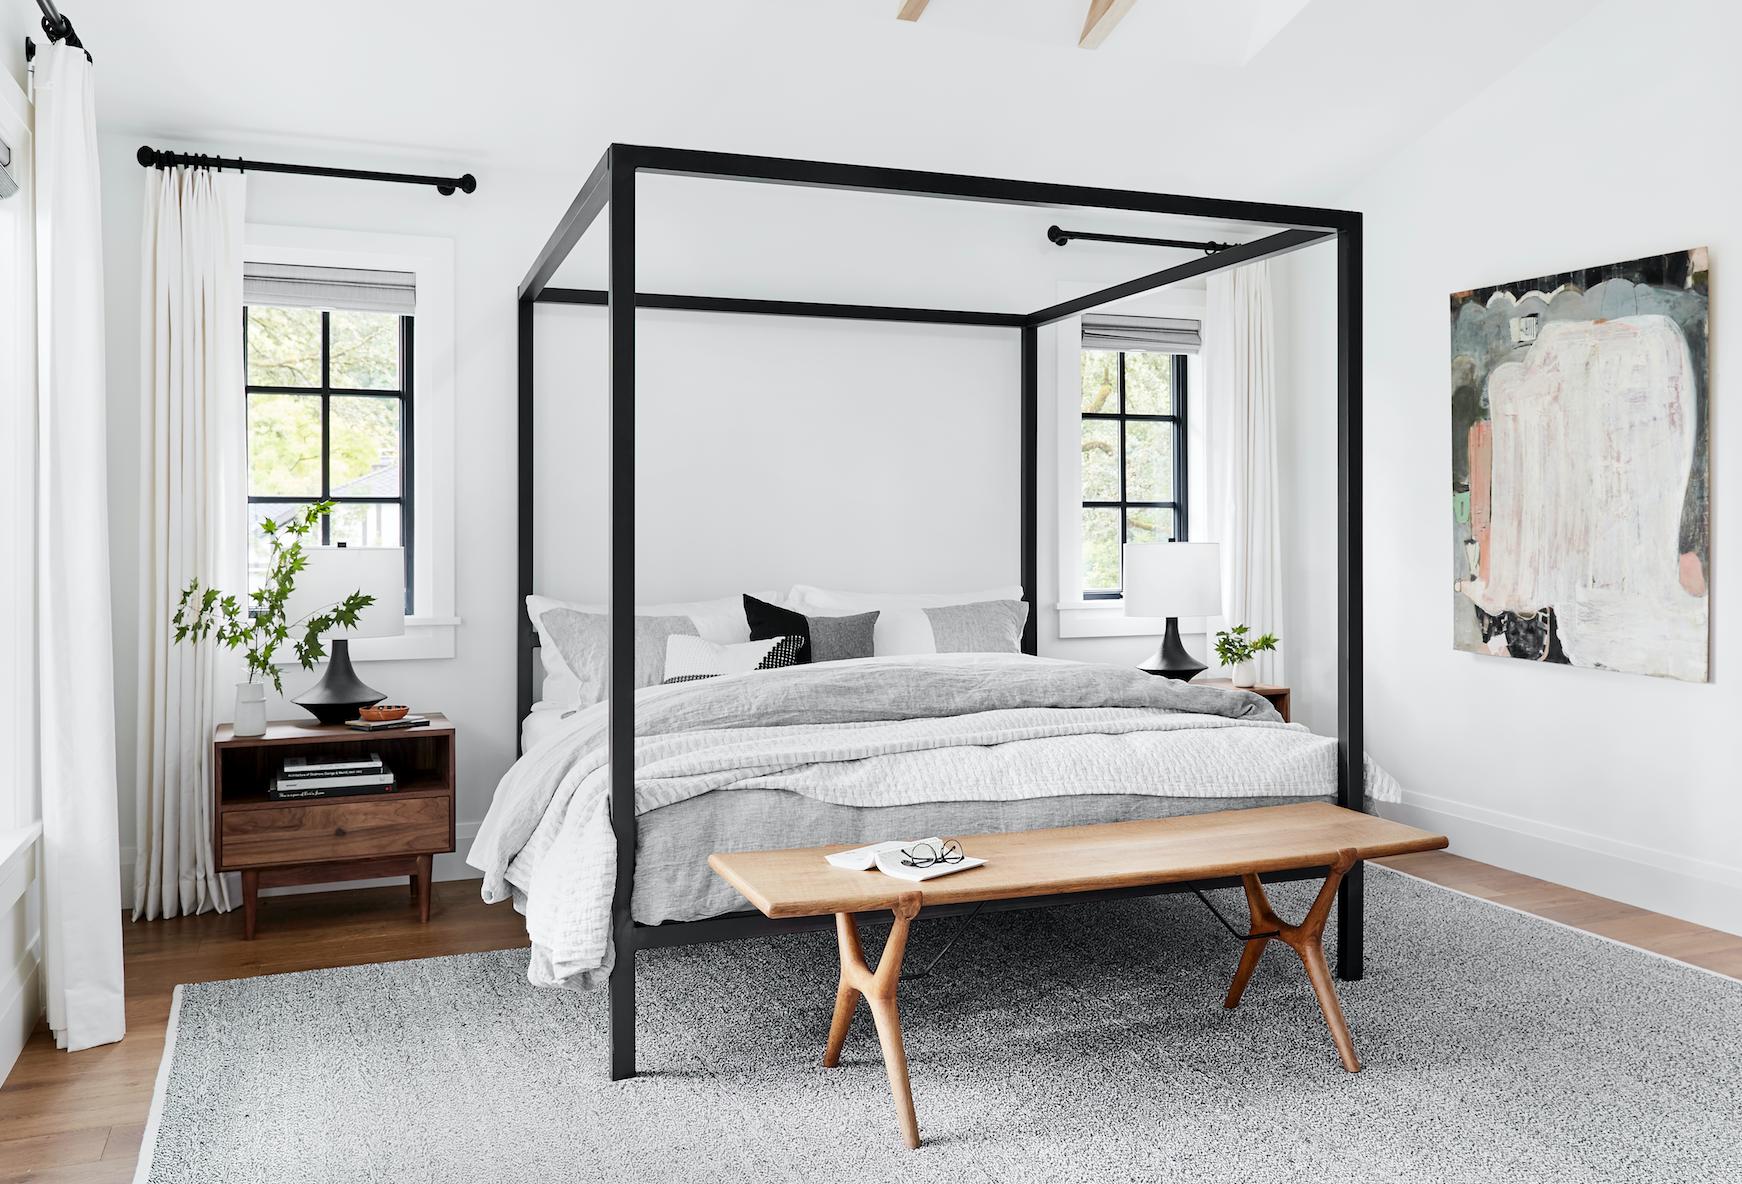 decorative small space room